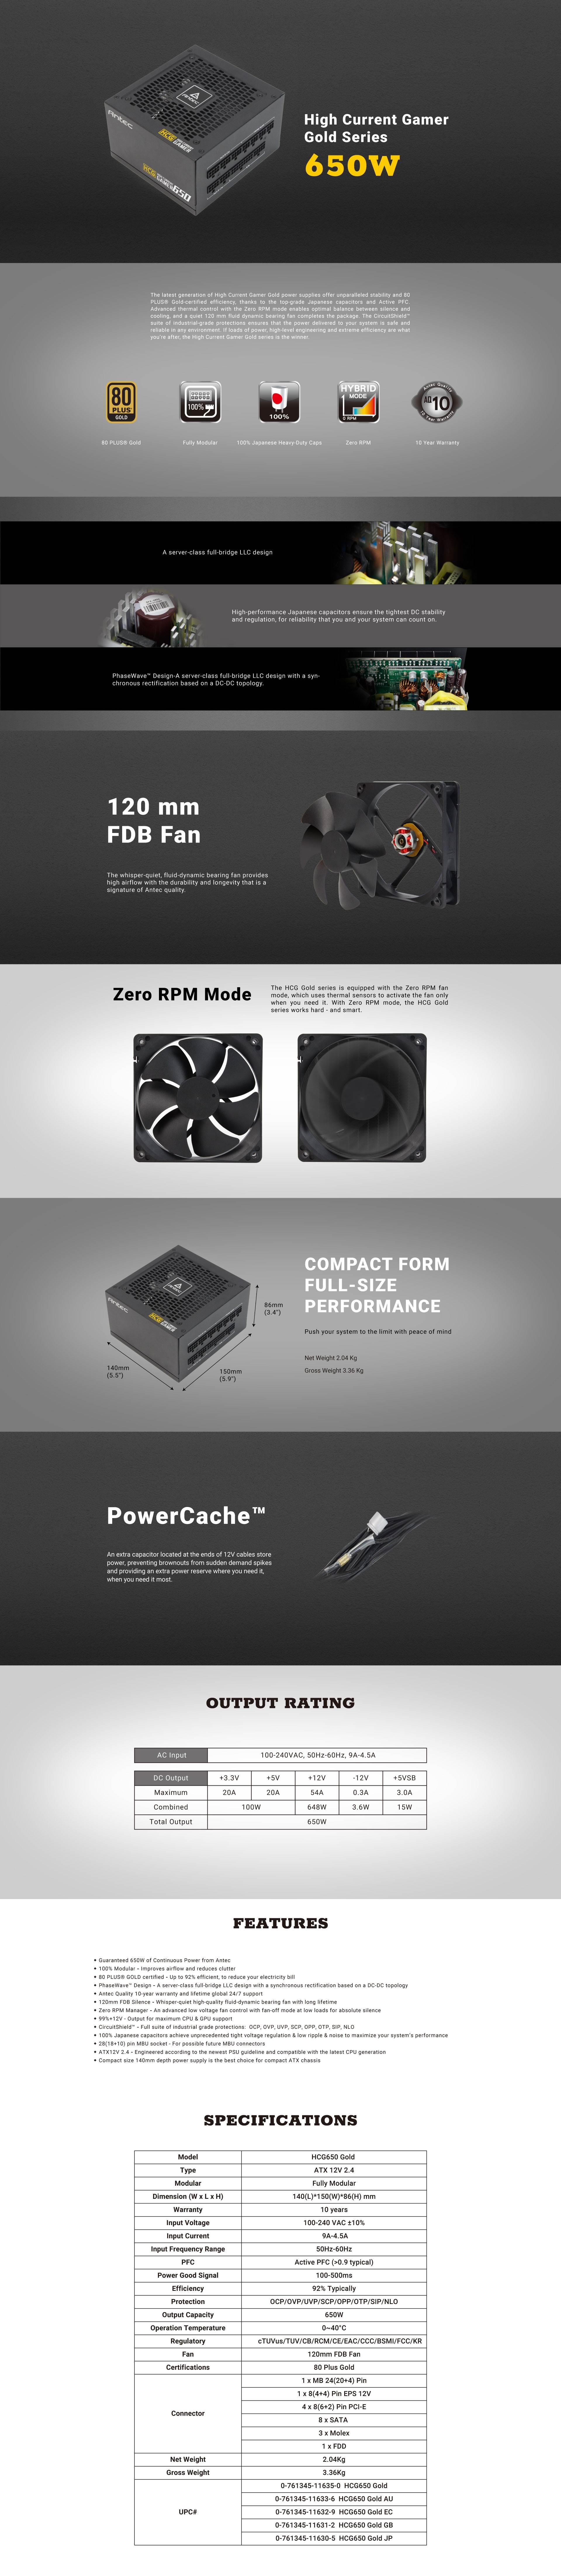 ANT-PSU-HCG650-GOLD : Antec High Current Gamer HCG 650W Gaming PSU